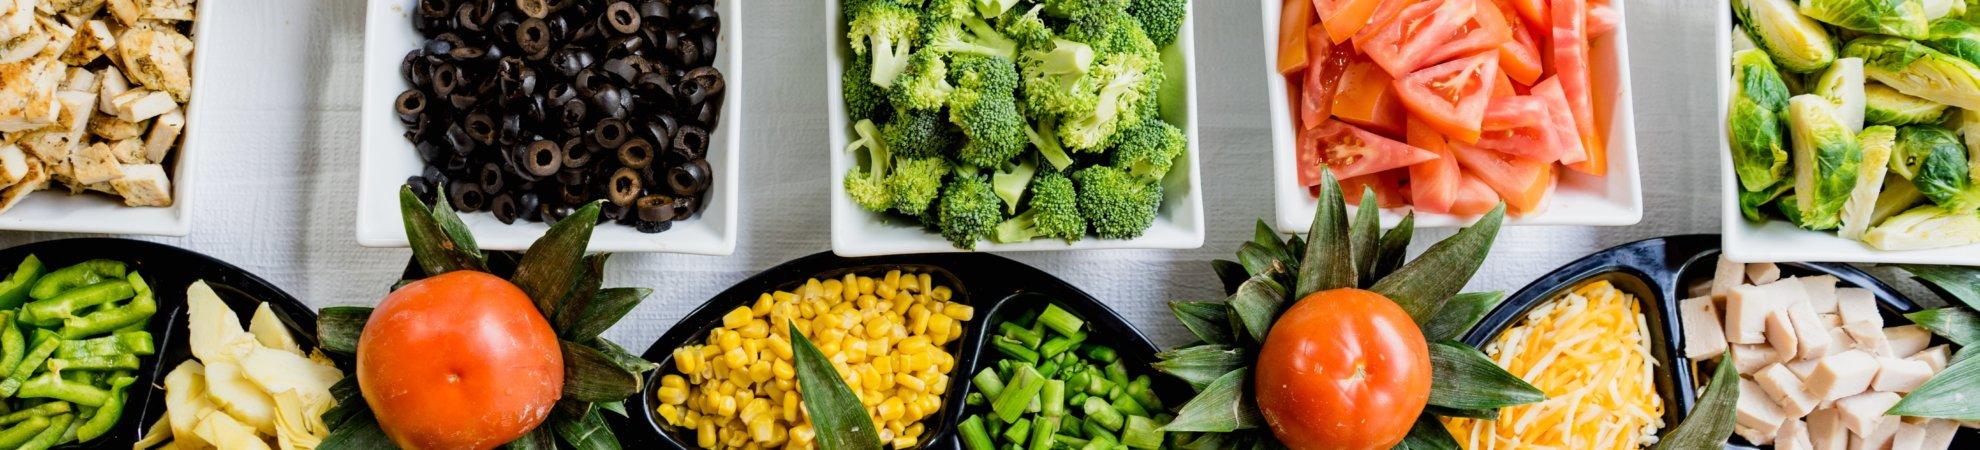 Easy vegan dinners